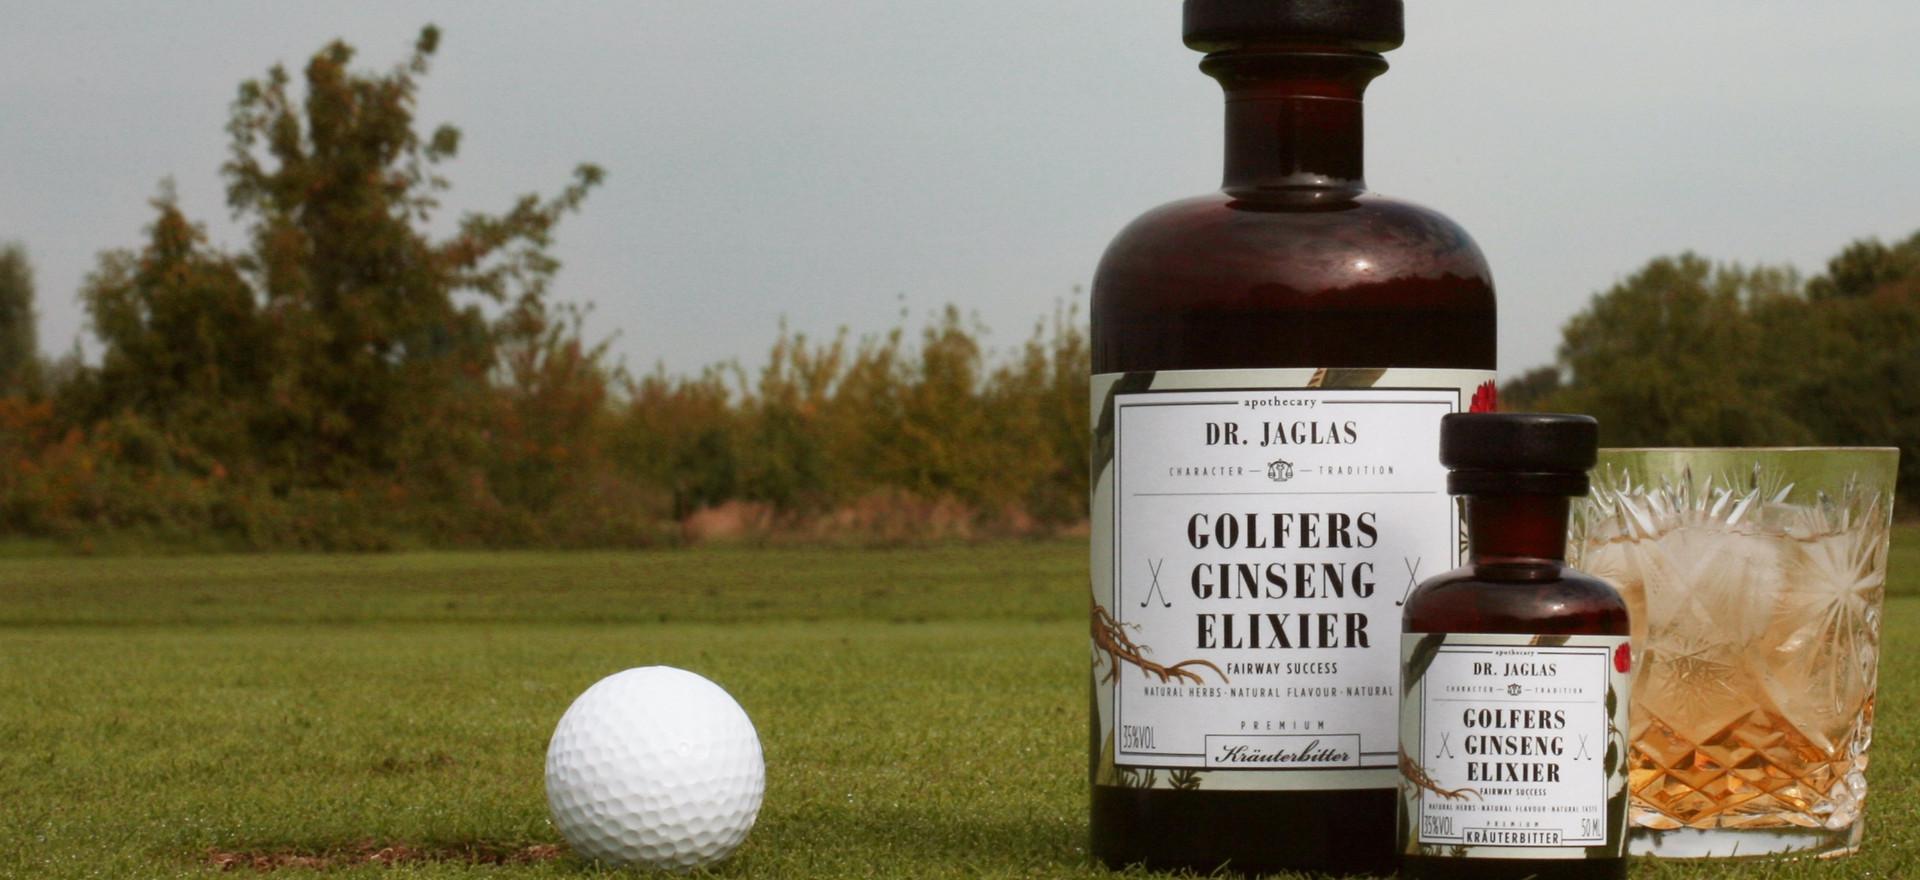 GolfersGinseng-Elixier_Mood_edited.jpg